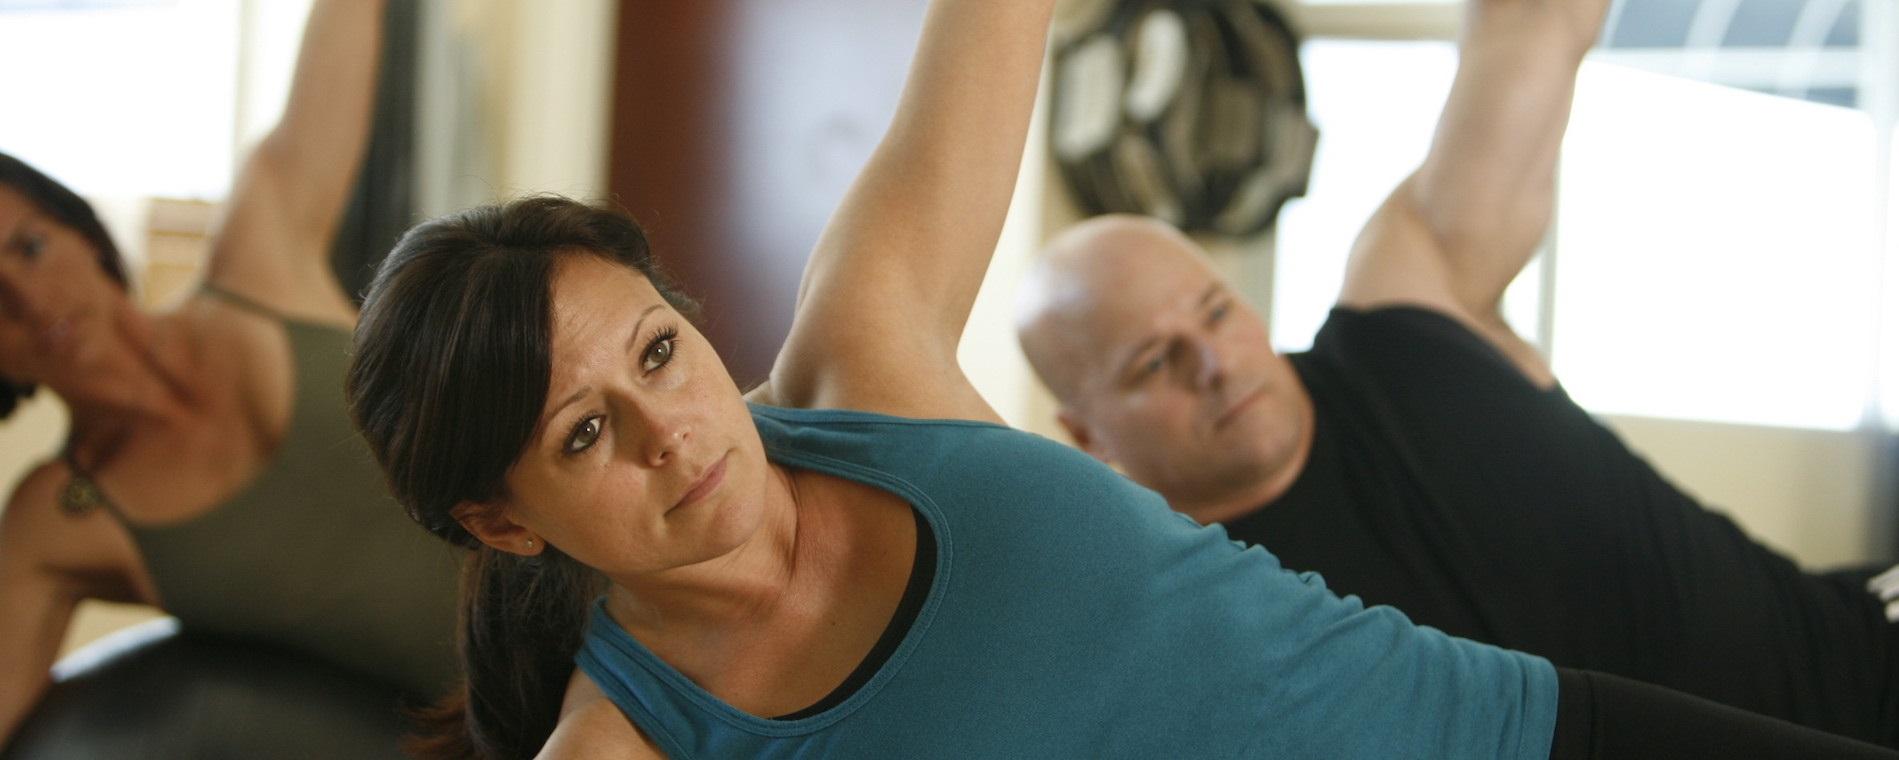 Classes | Center for Health & Fitness